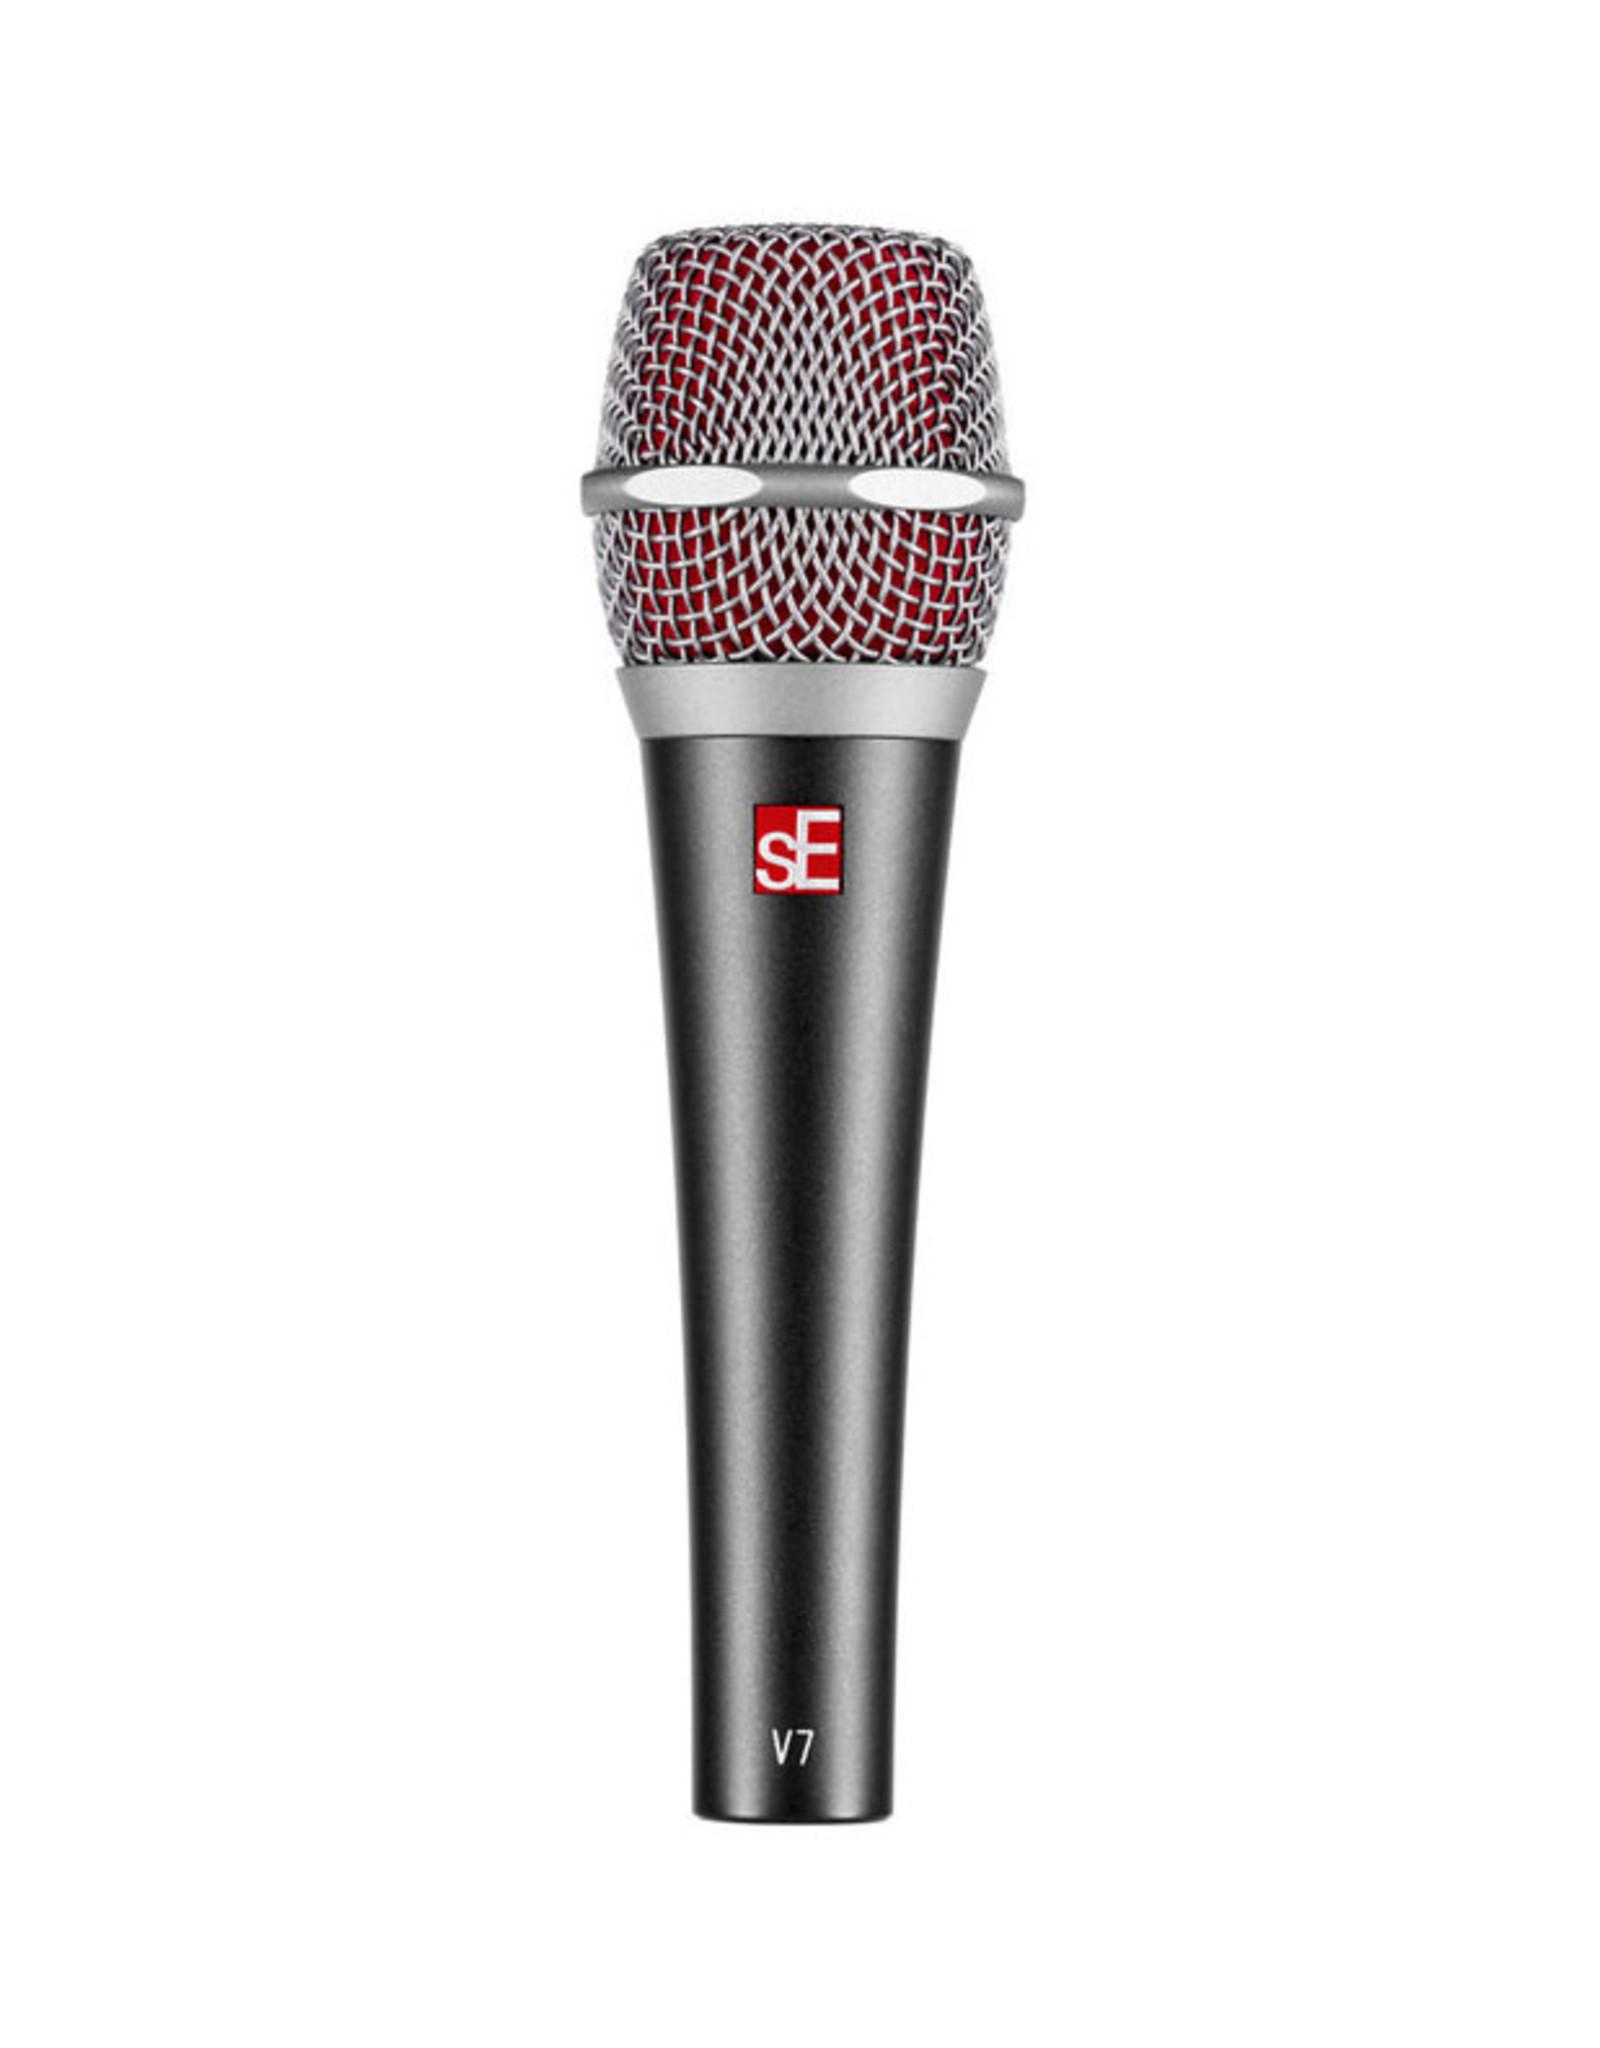 sE sE Electronics V7 Supercardioid Dynamic Handheld Vocal Microphone